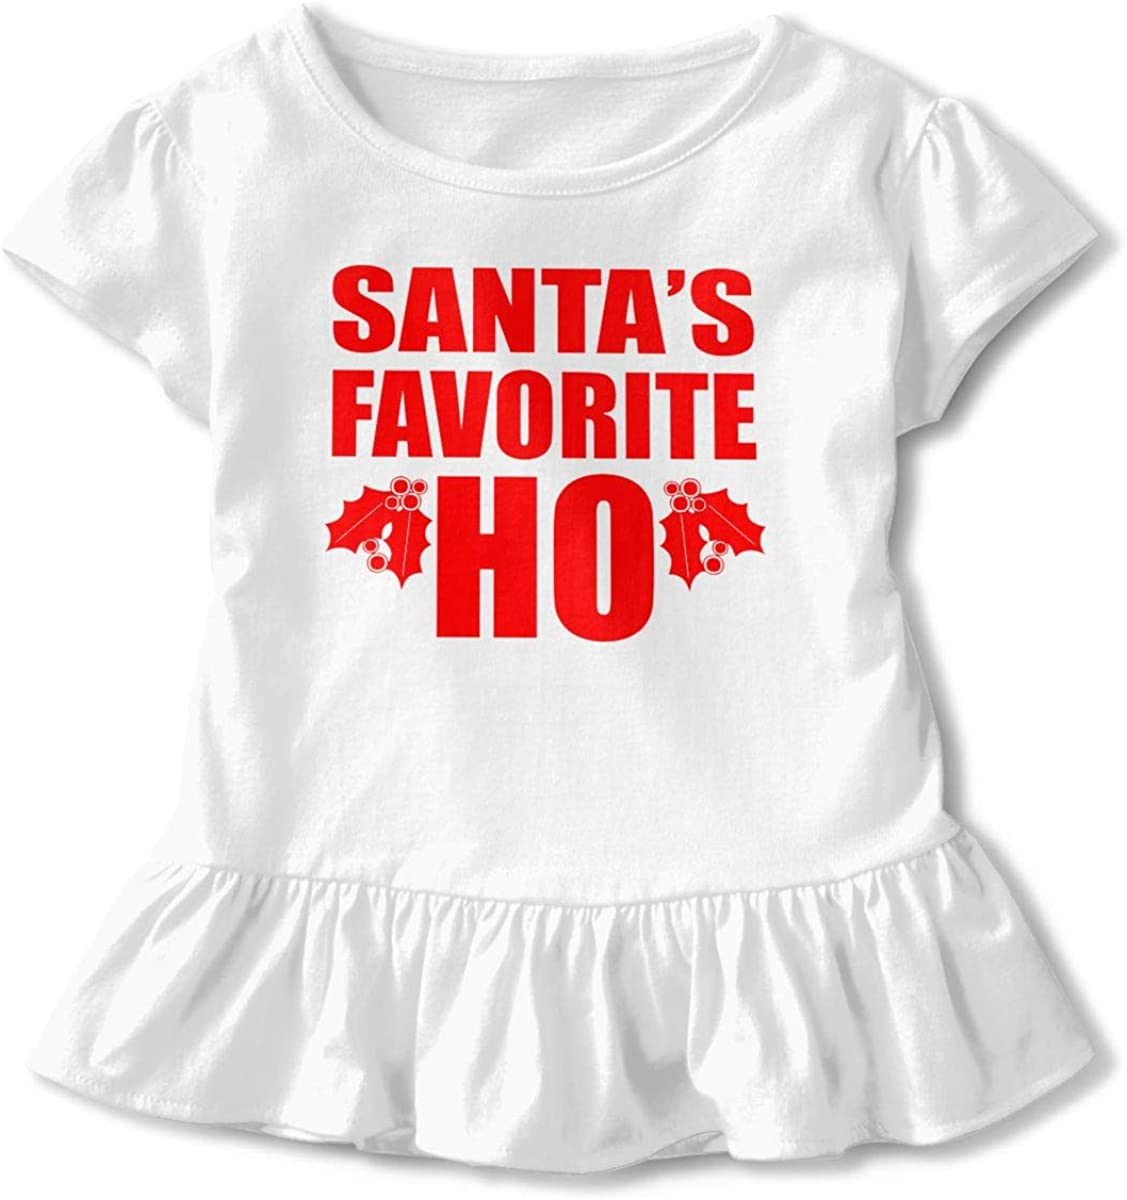 NMDJC CCQ Santas Favorite Ho Ugly Christmas Baby Skirts Cute Kids T Shirt Dress Cotton Flounces Layette